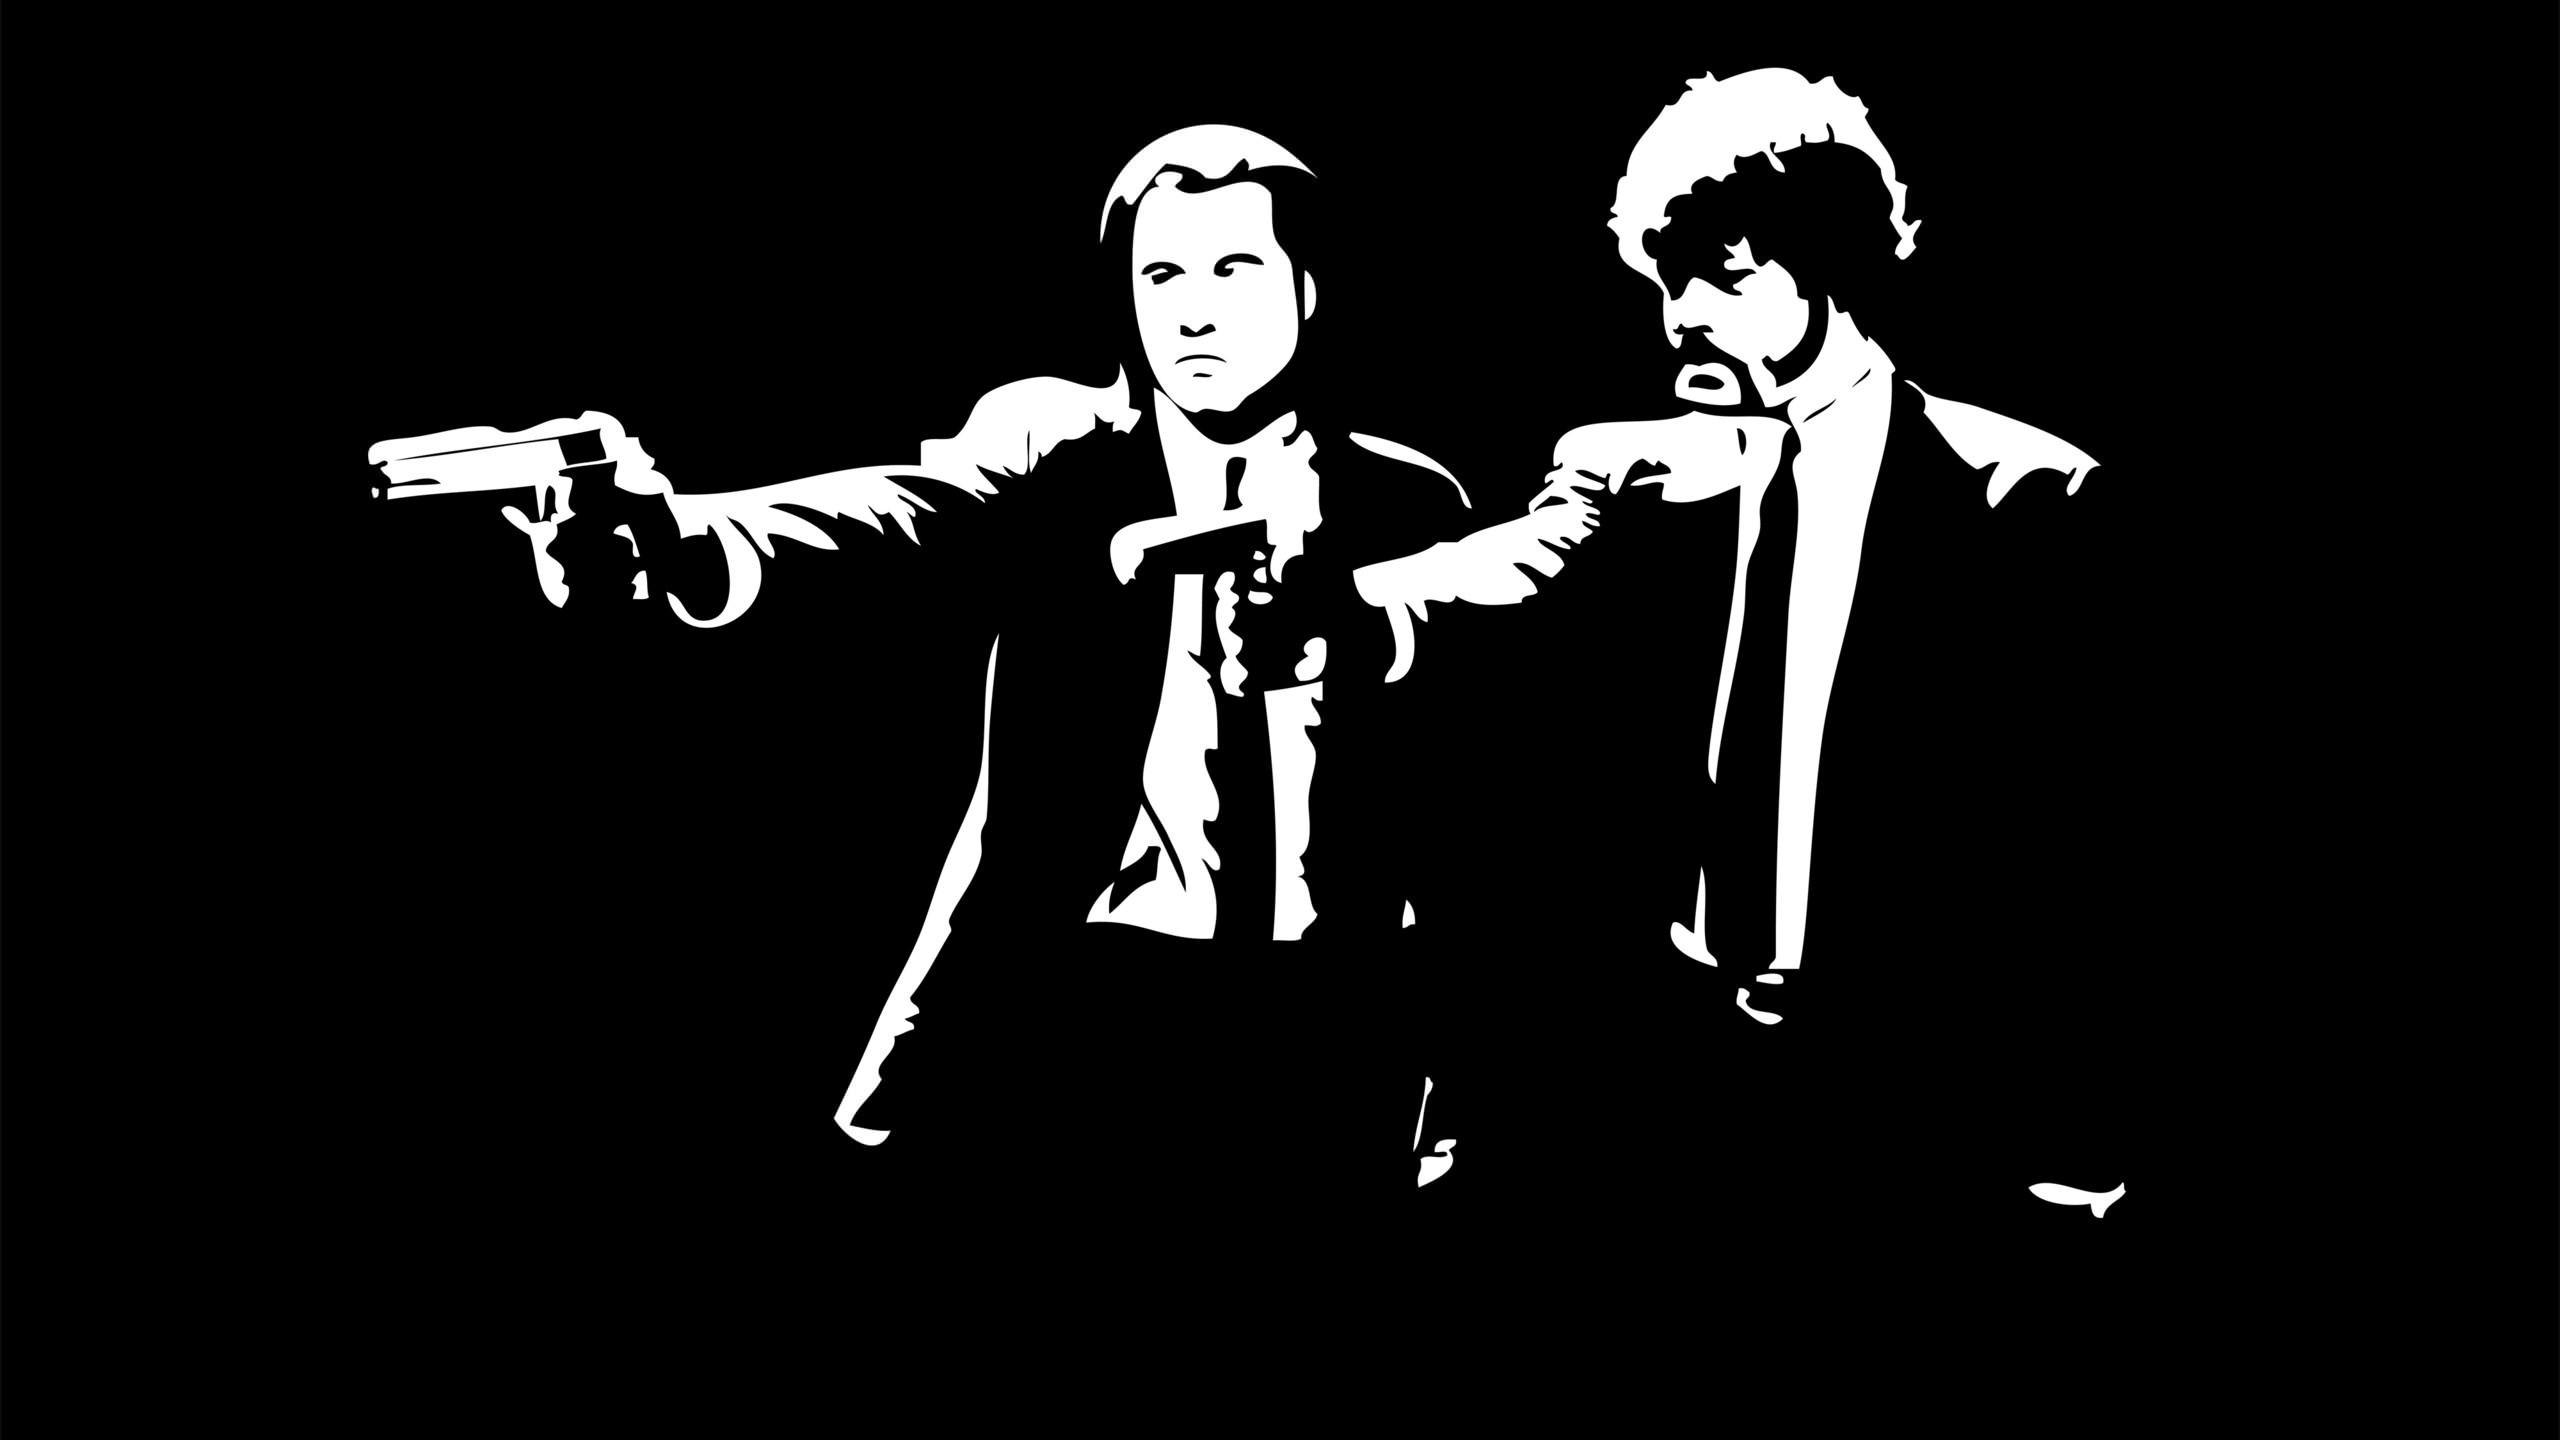 John Travolta, Samuel Jackson, Pulp Fiction, Pulp Fiction Action Art